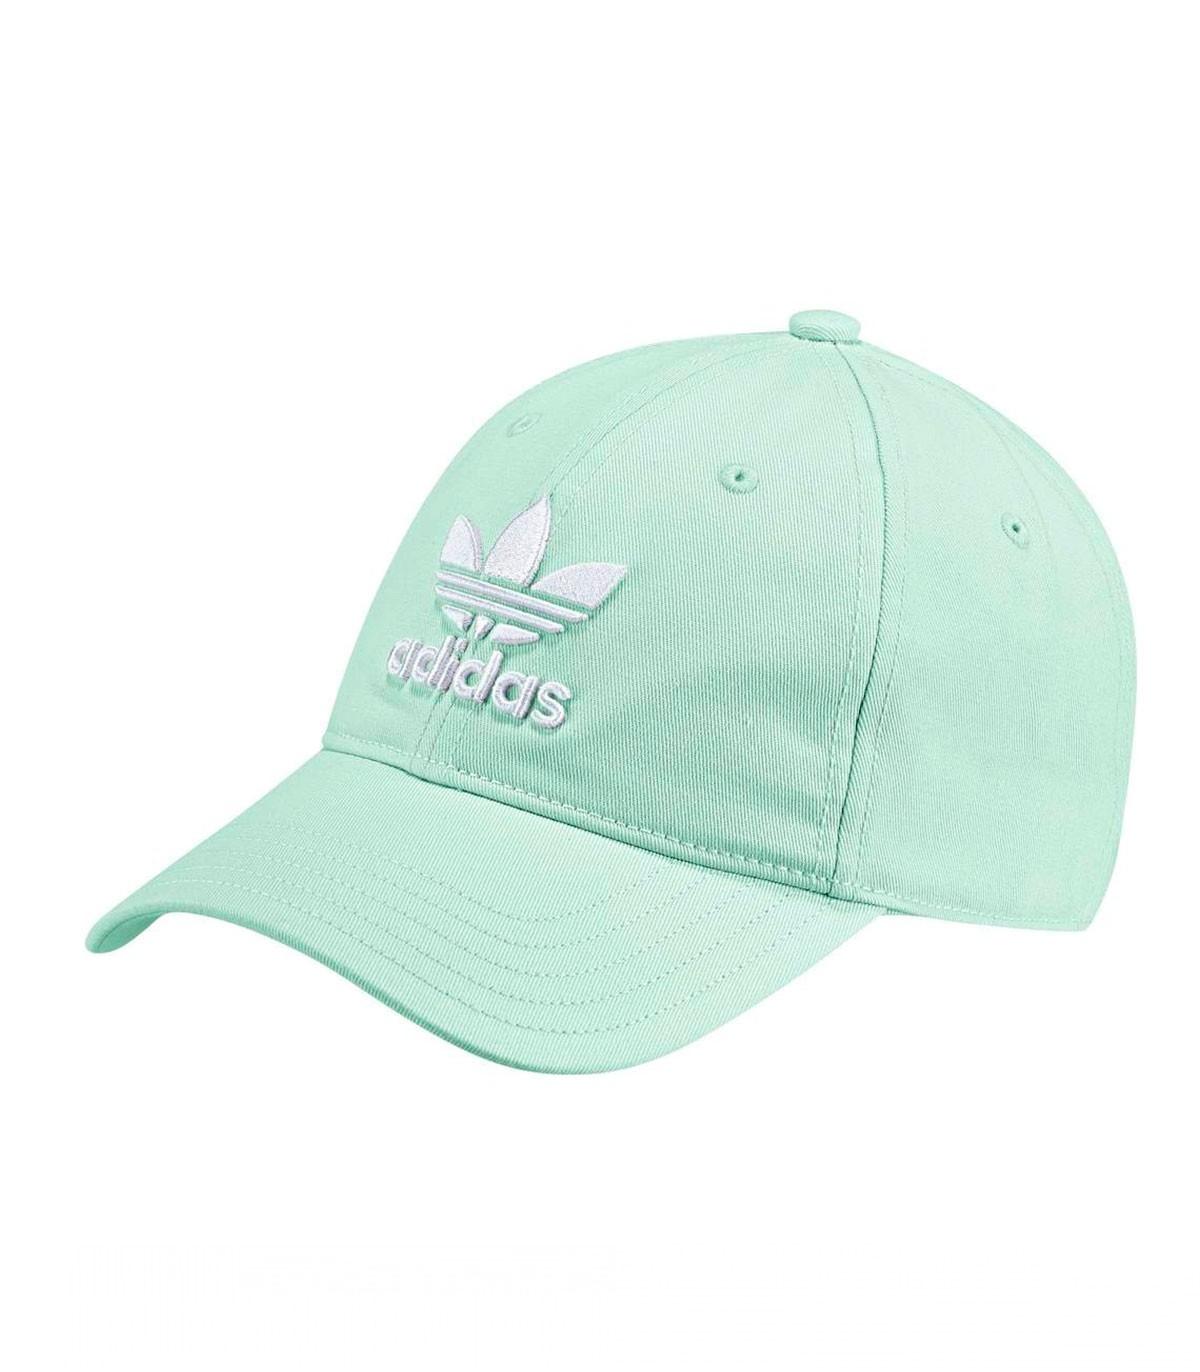 b2635c6cd2ed4 Buy Adidas Gorra Trefoil Cap